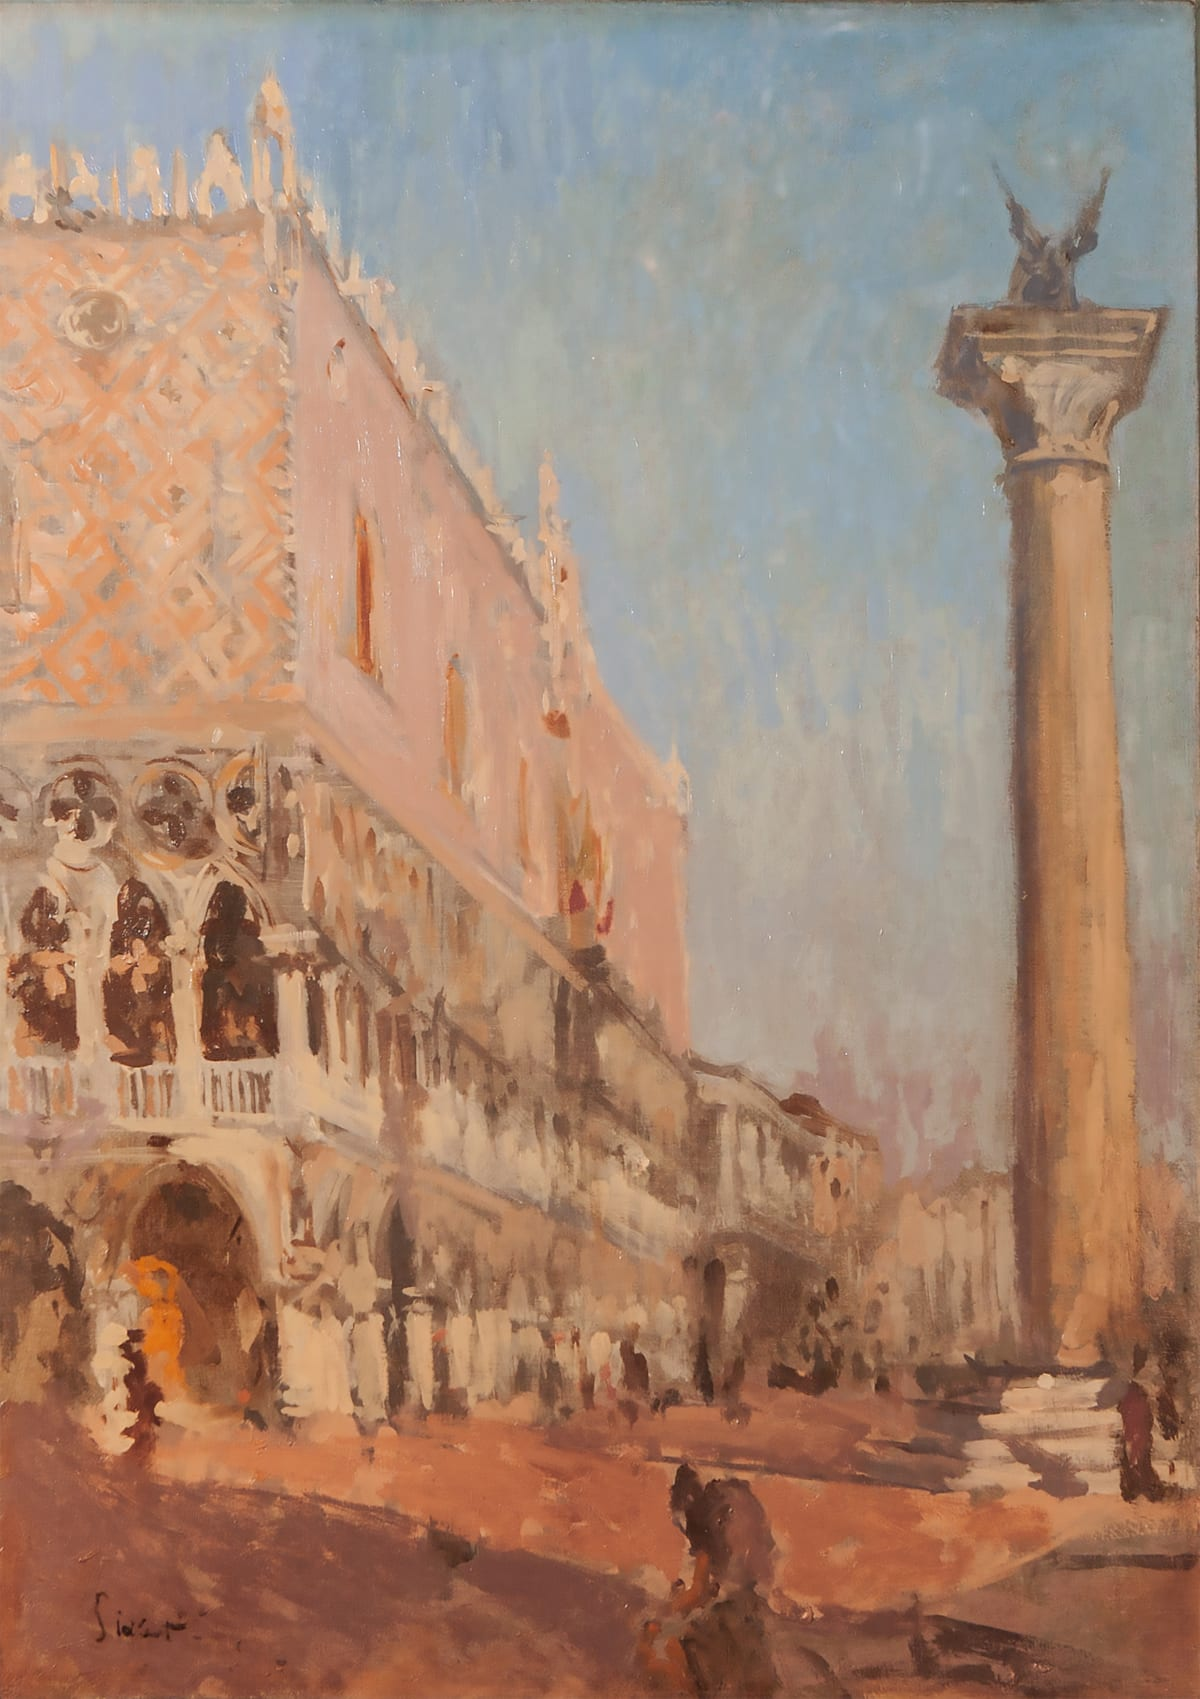 Walter Richard Sickert (British, 1860-1942), Doge's Palace, Venice , circa 1901